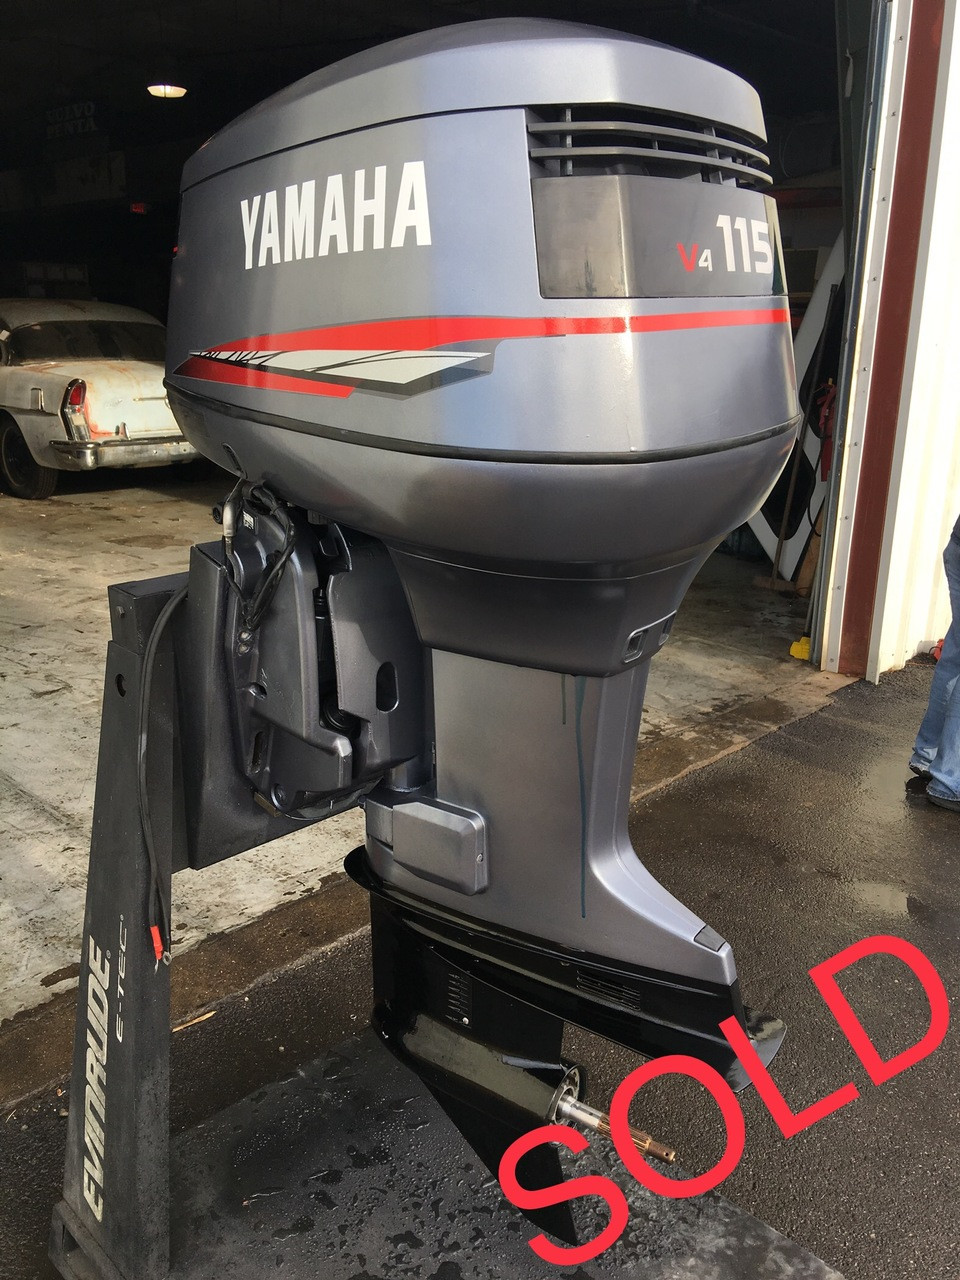 2004 Yamaha 115 Hp V4 2 Stroke 20 U0026quot  Outboard Motor